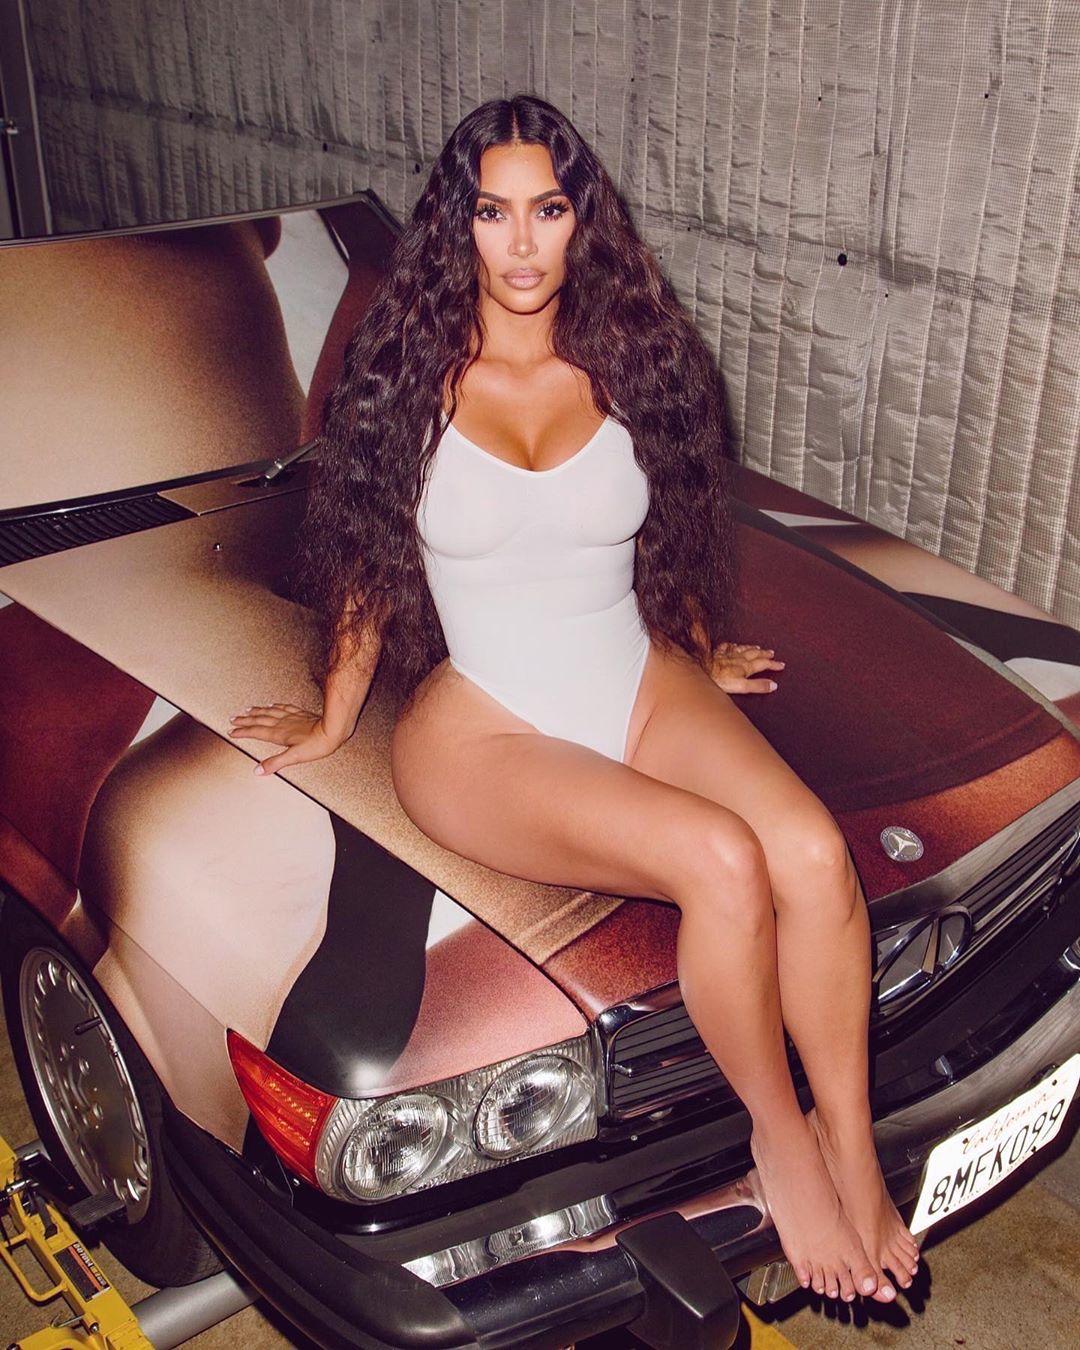 Kim Kardashian rocking a Plunging white Skims bodysuit with a V-neck and spaghetti straps